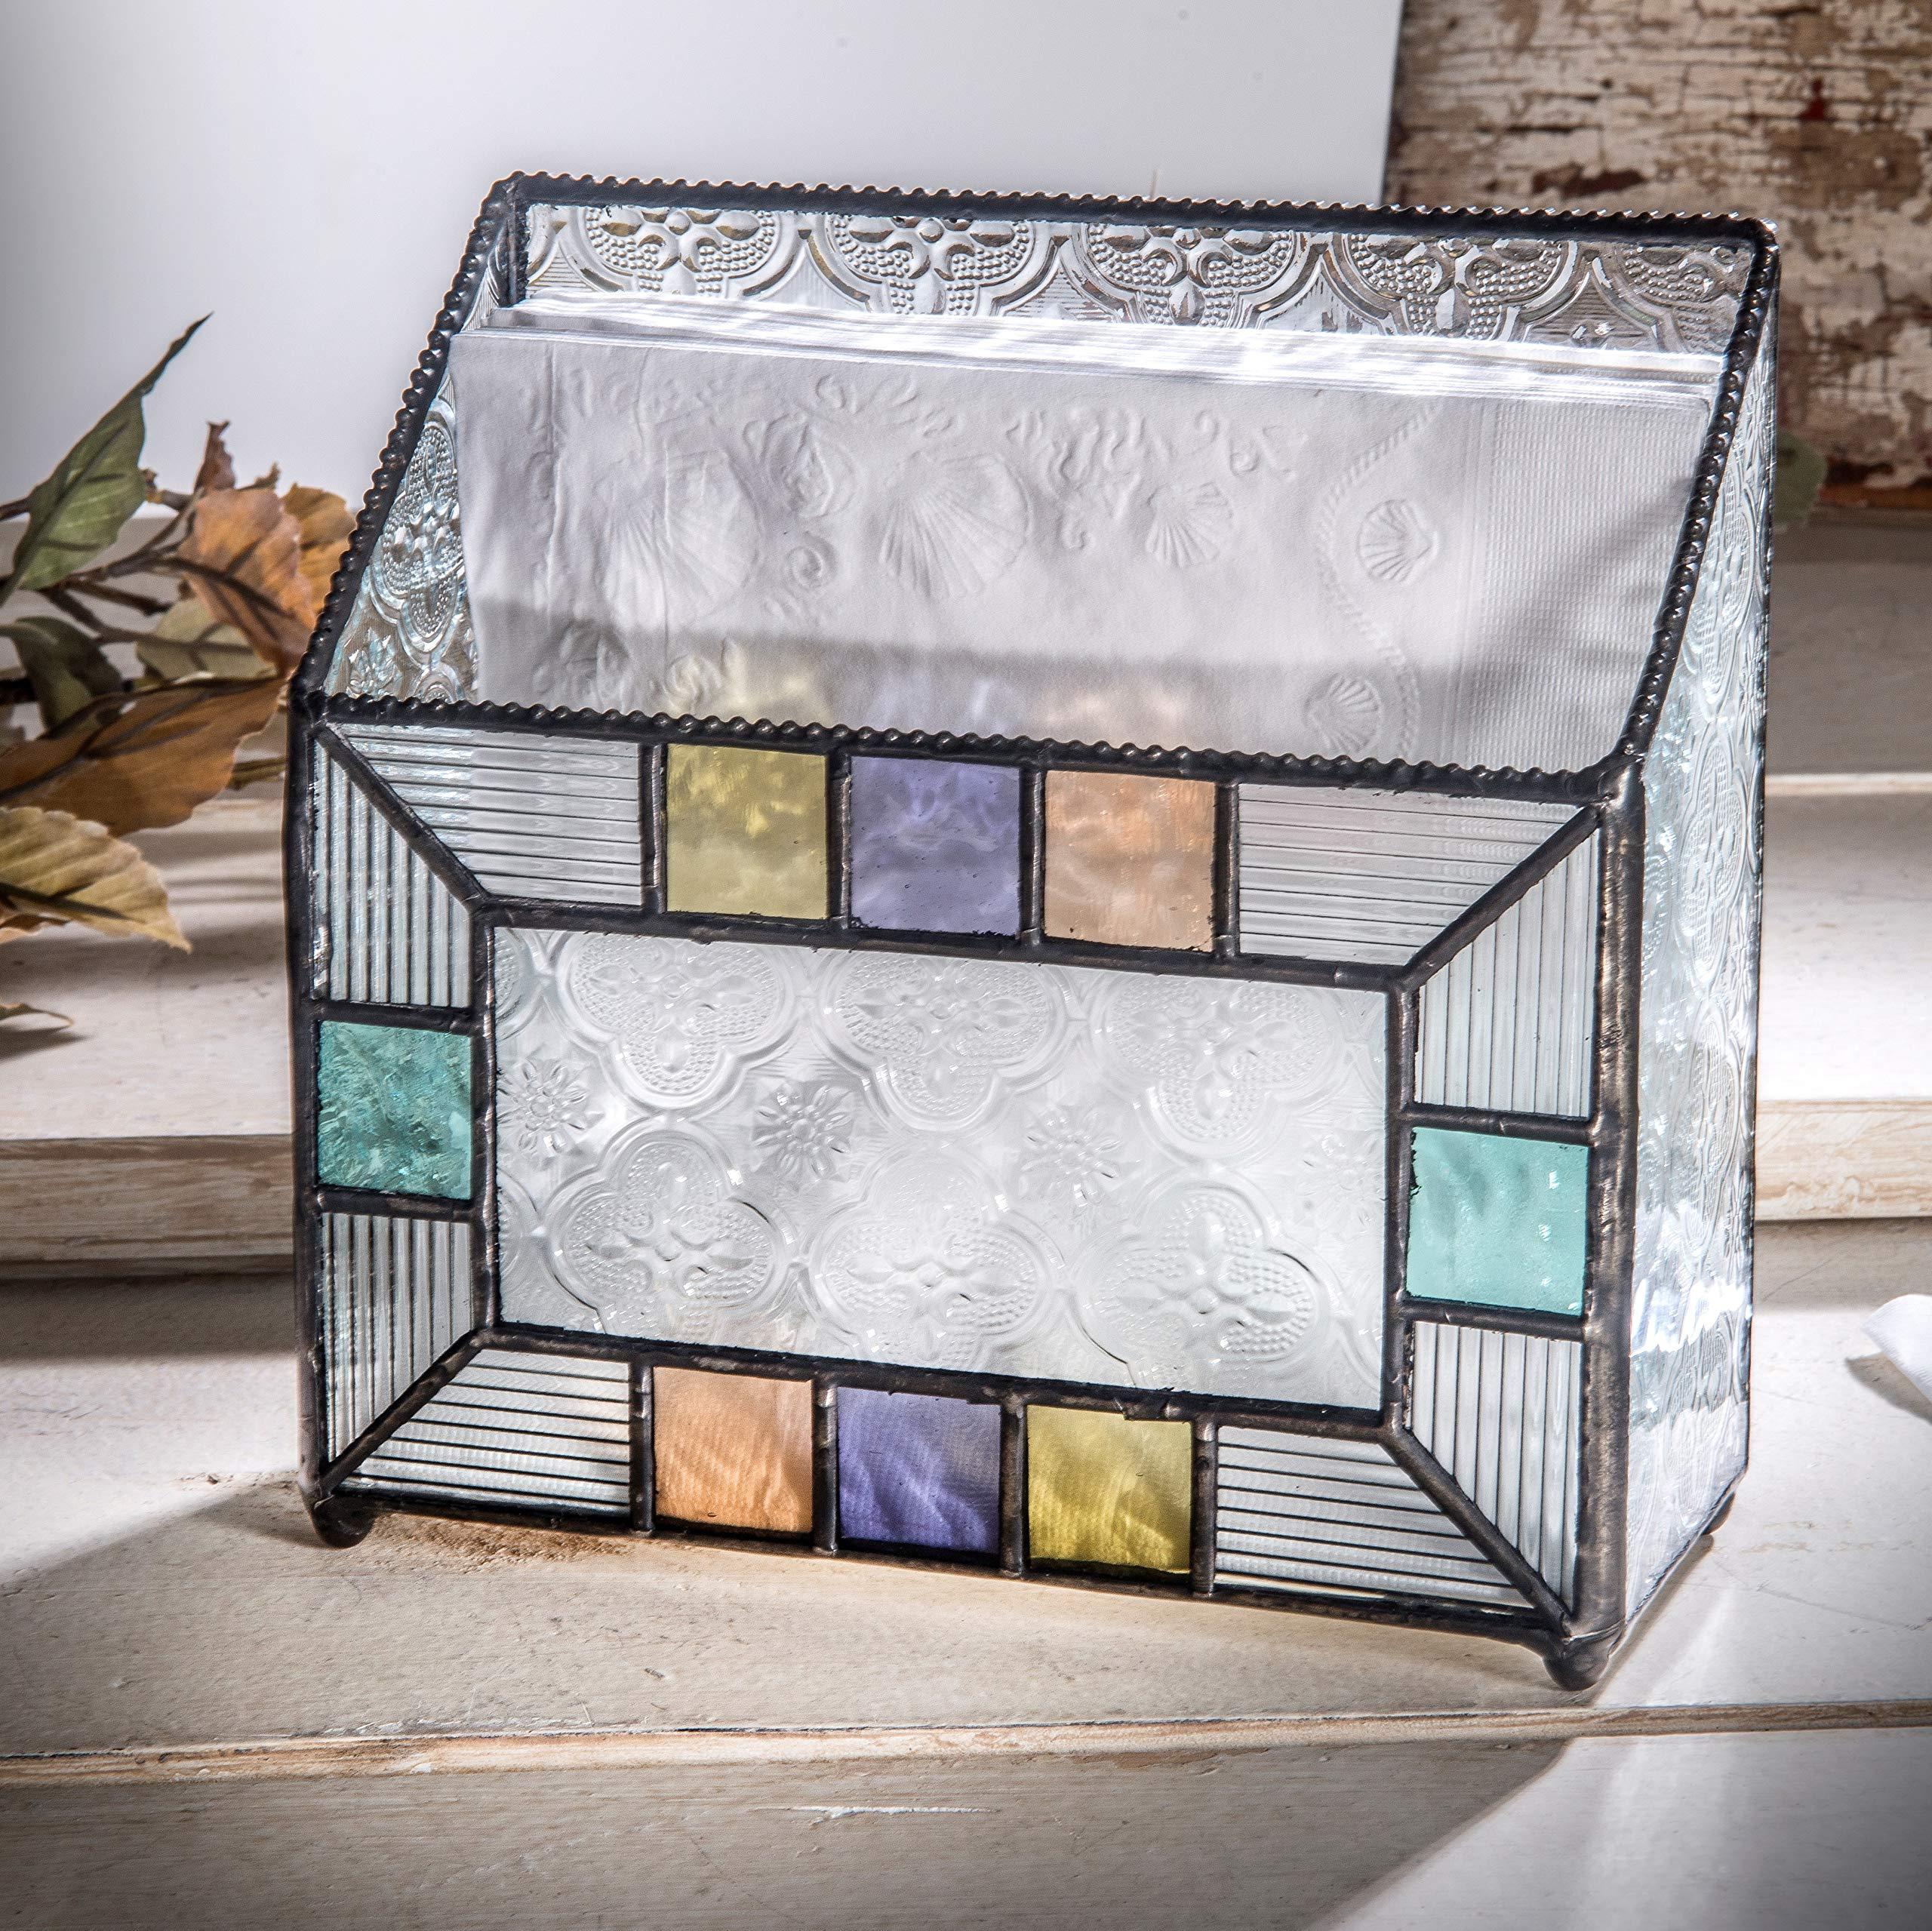 J Devlin Dis 203 Napkin Holder Kitchen Decor Vintage Glass Napkin Tray by J Devlin Glass Art